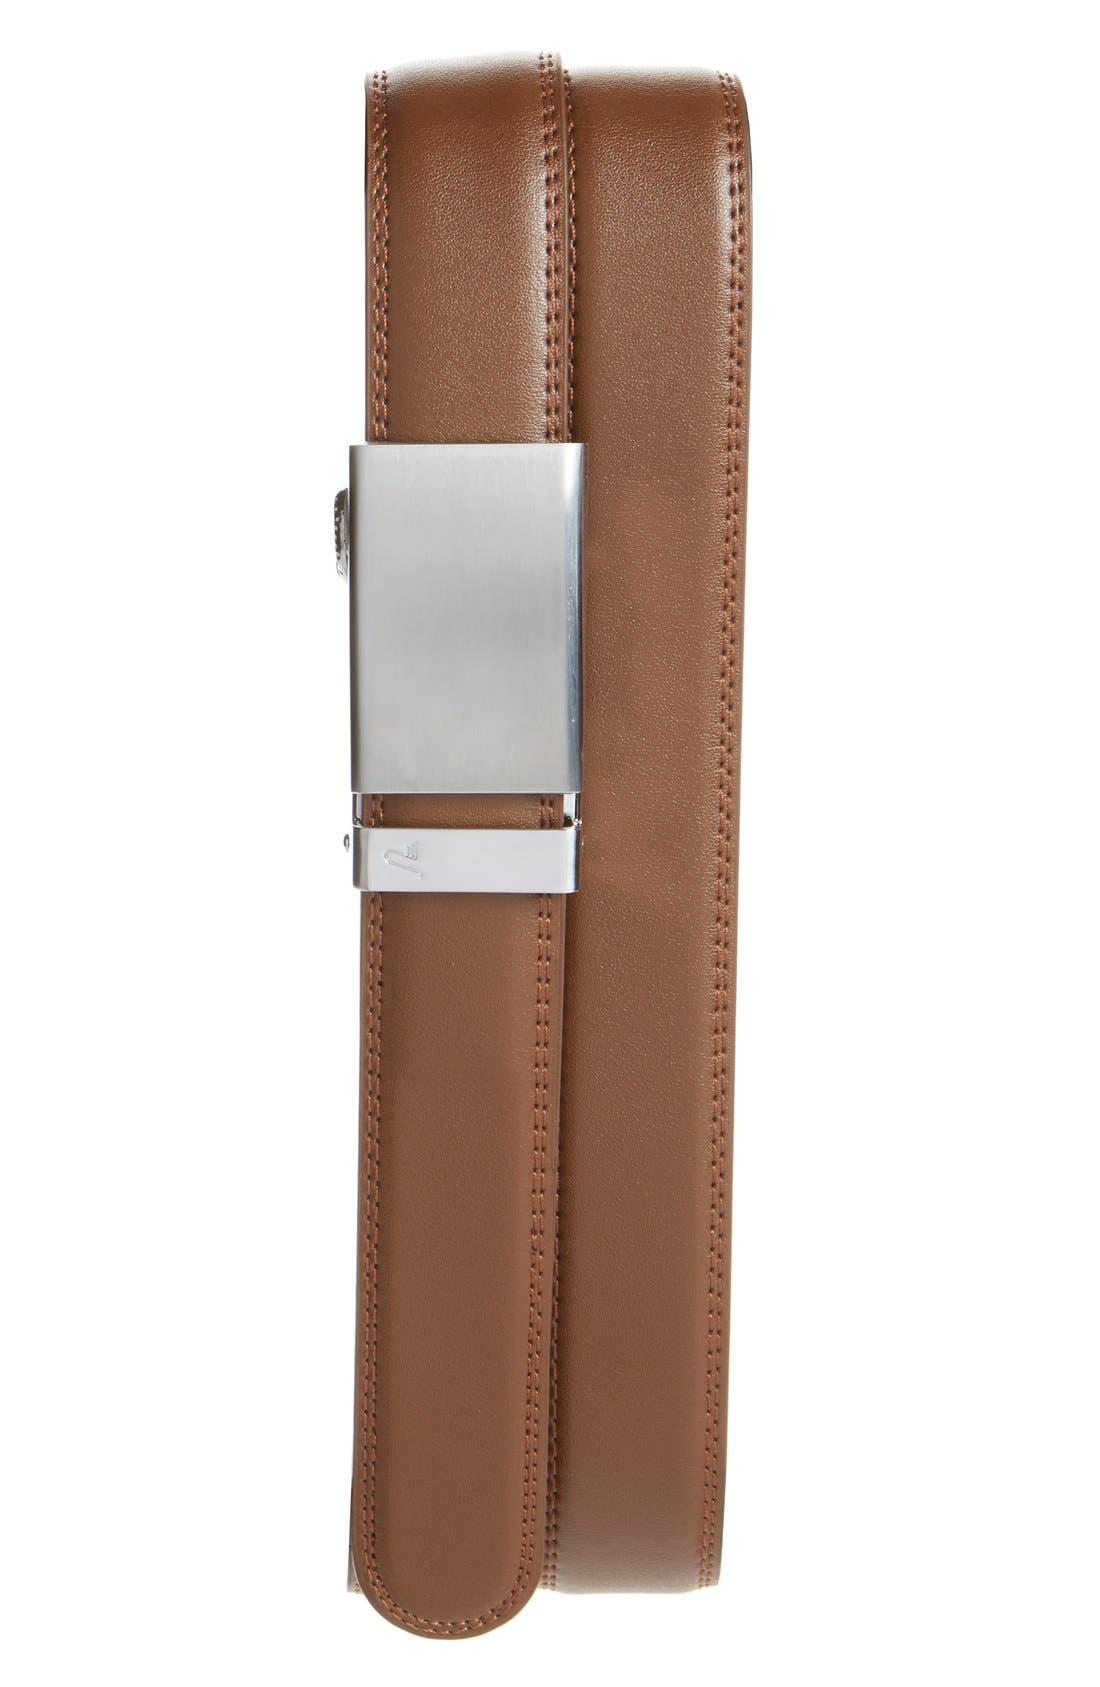 MISSION BELT Cocoa Leather Belt